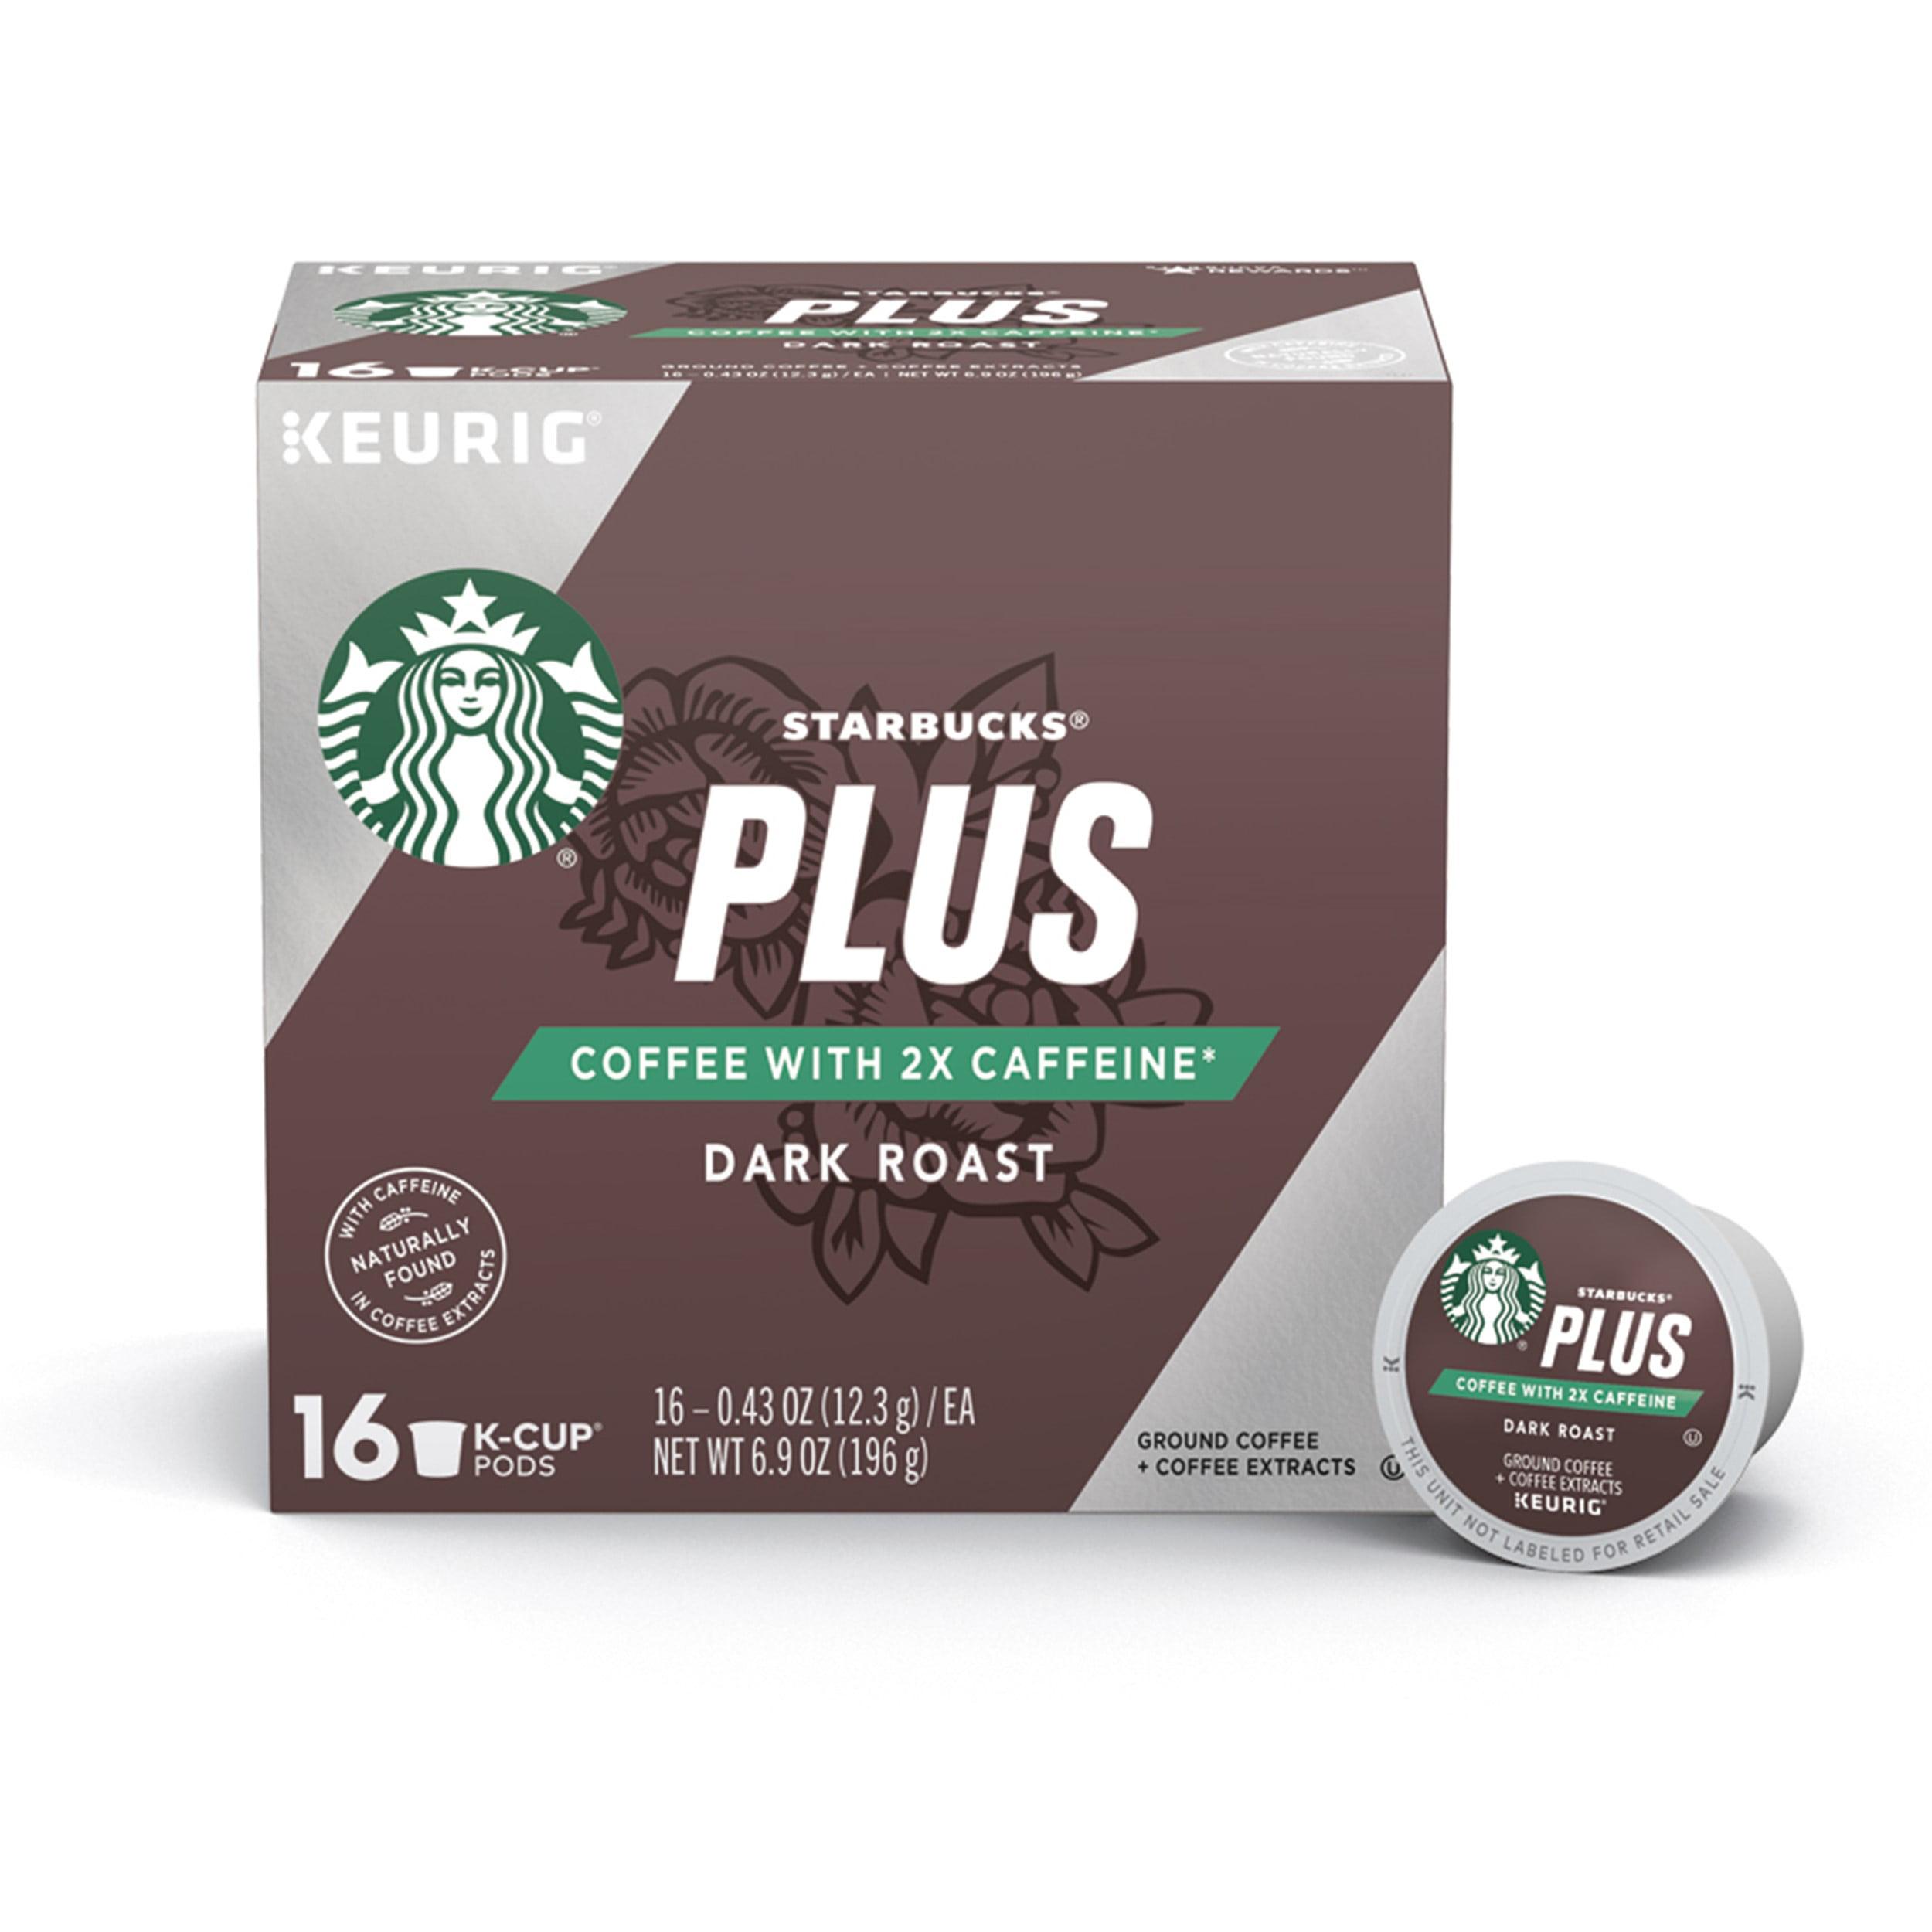 01c95b6a97f Starbucks Plus Coffee 2X Caffeine Dark Roast Single Cup Coffee for Keurig  Brewers, One Box of 16 (16 Total K-Cup Pods) - Walmart.com